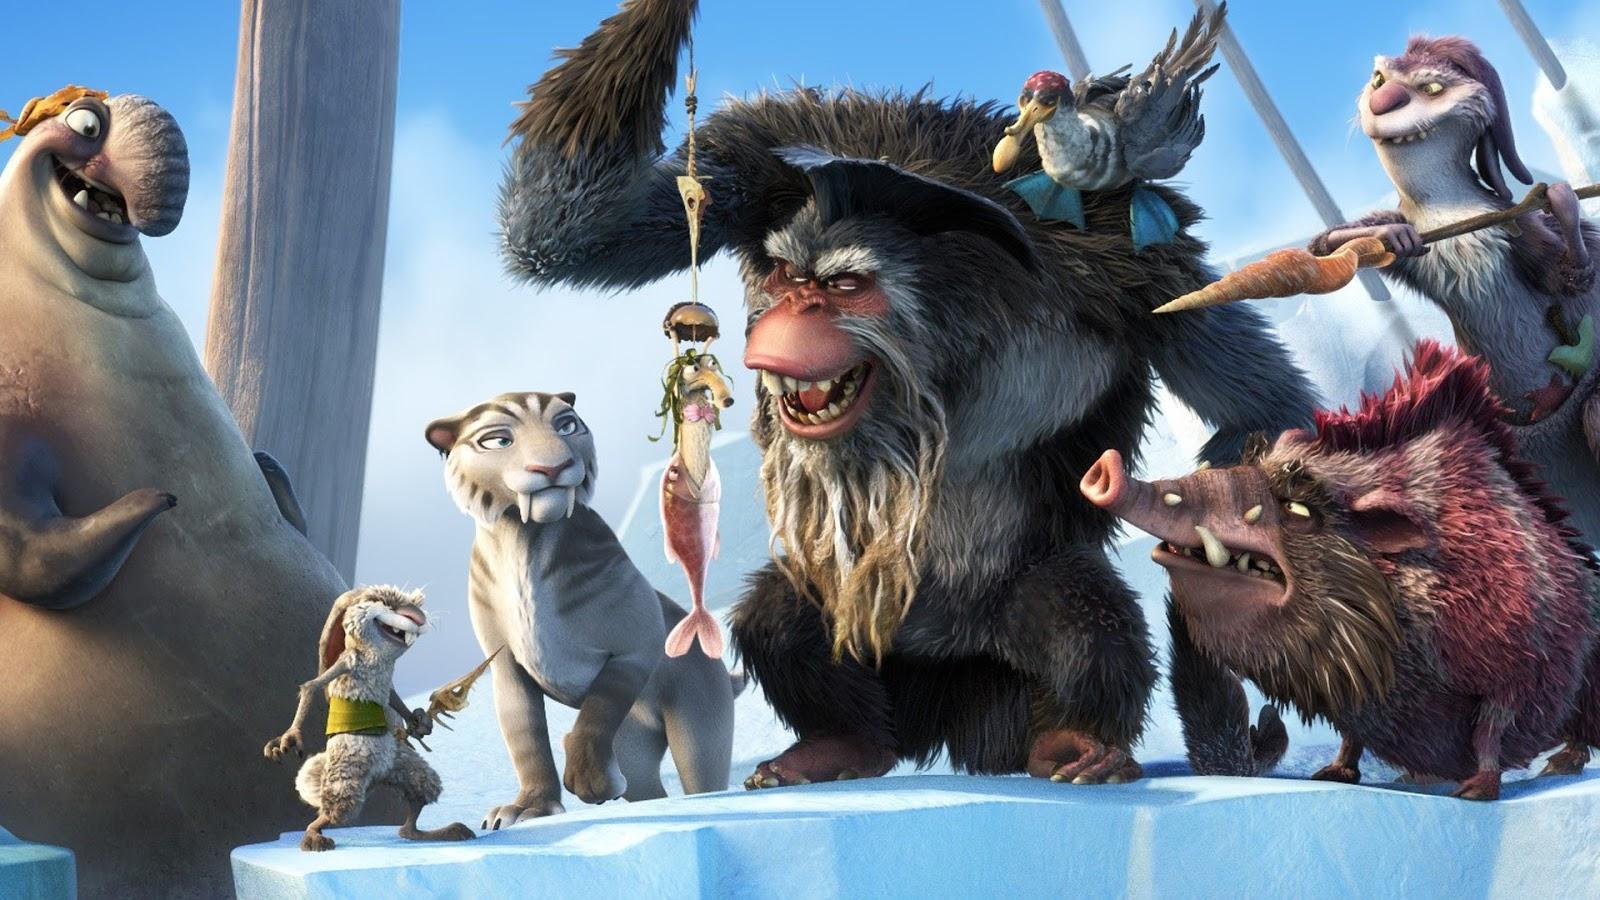 Ice age 1 telugu dubbed movie free download poicysiract wattpad.